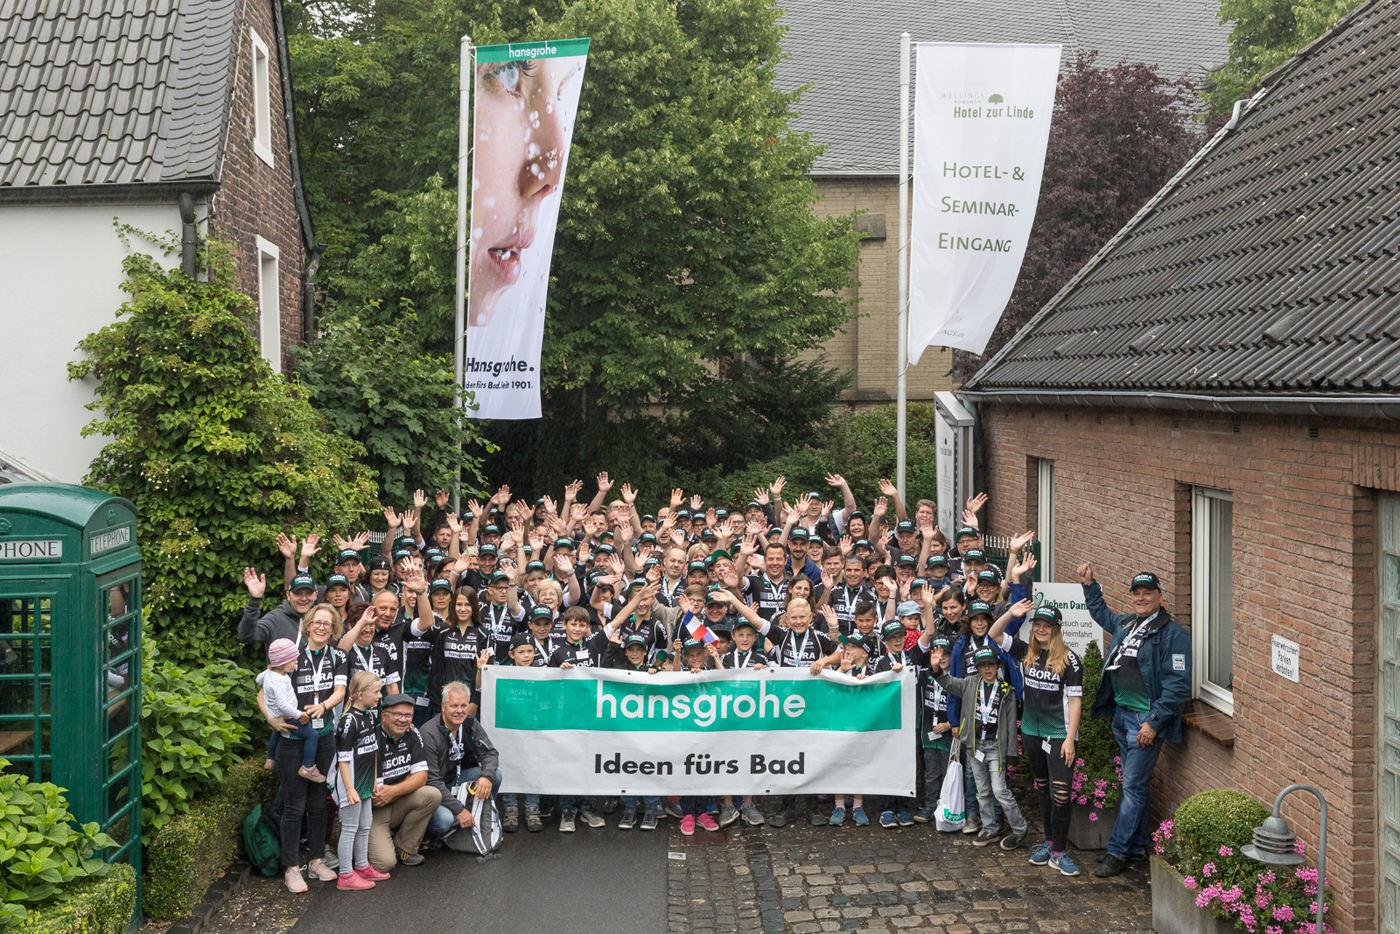 Events, Veranstaltungen, Hansgrohe, I-Club, Familienfest, Incentive, I-Club Mitglieder, Düsseldorf, Tour de France,  Agentur Ravensburger